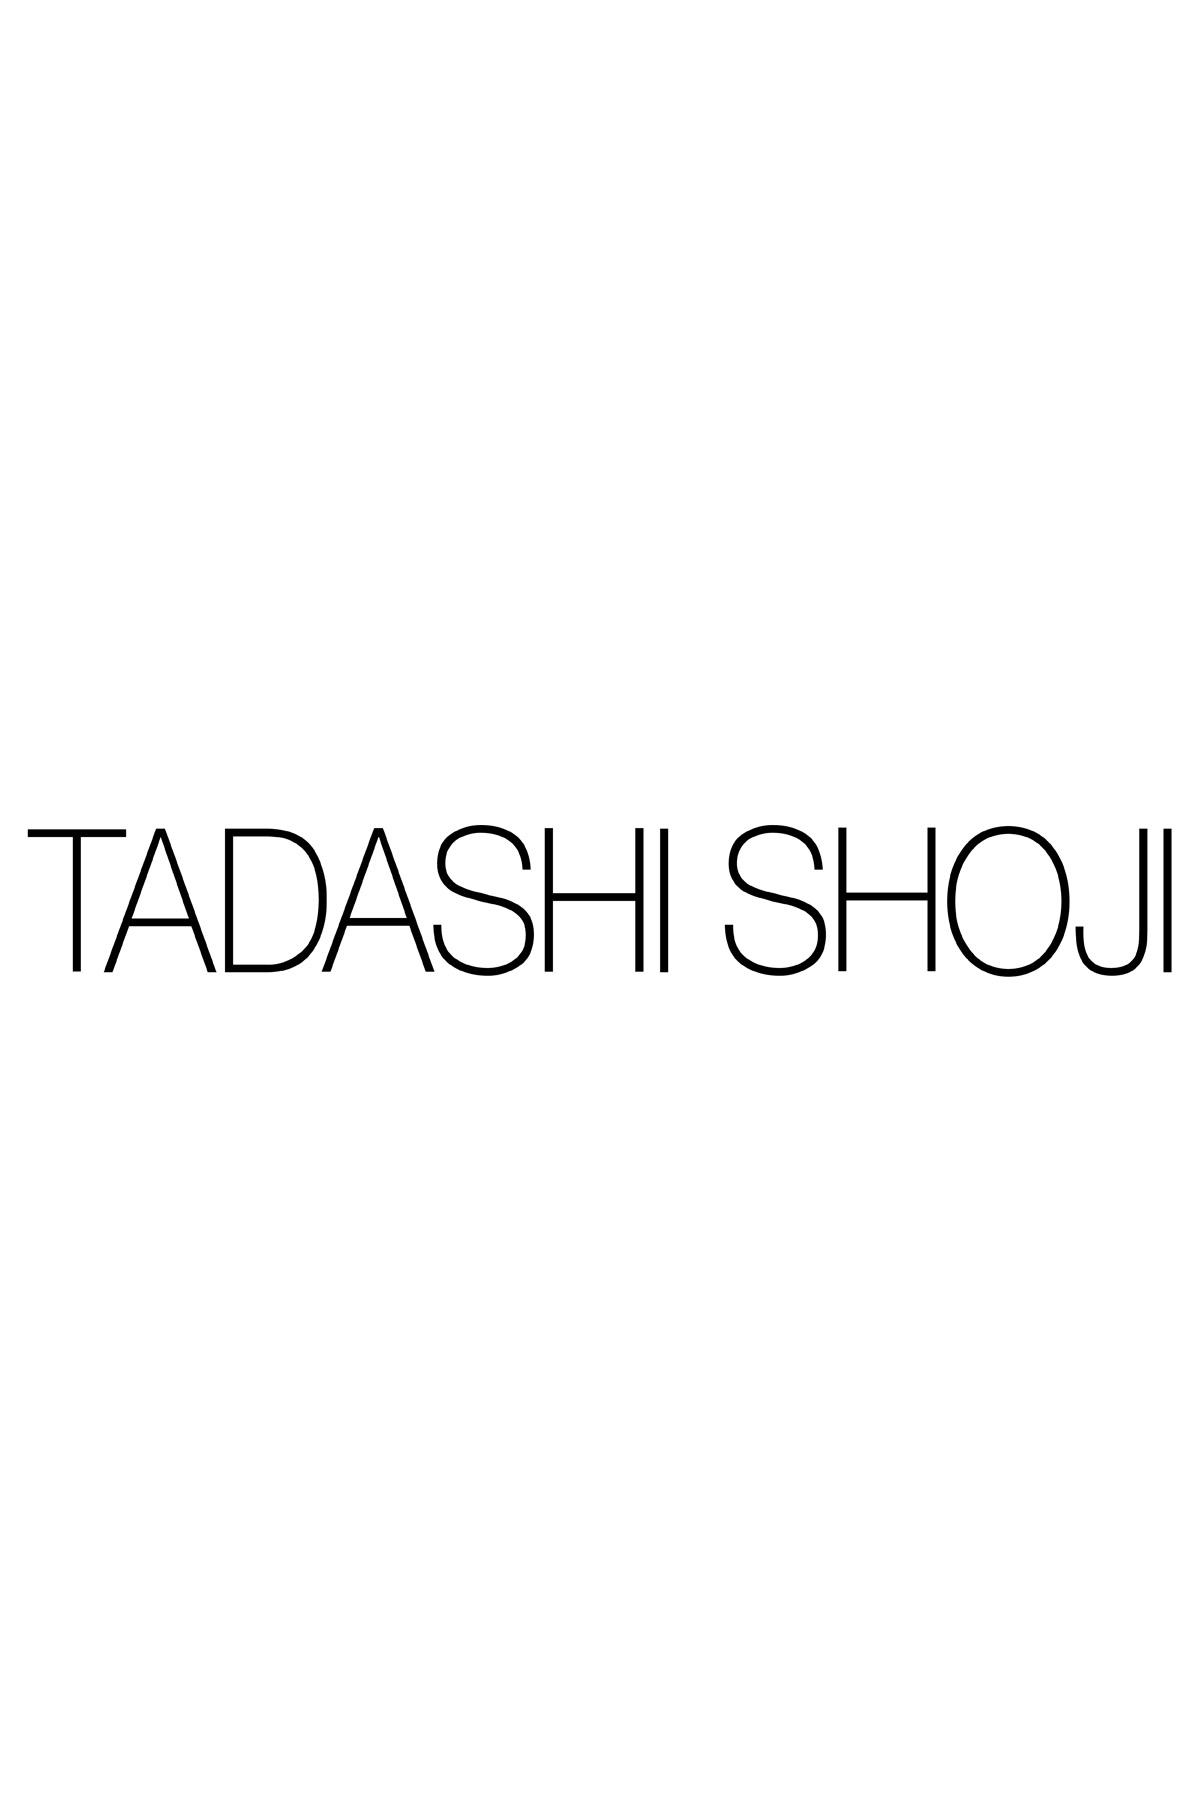 Tadashi Shoji - Jasmine Floral Embroidered Crepe Gown